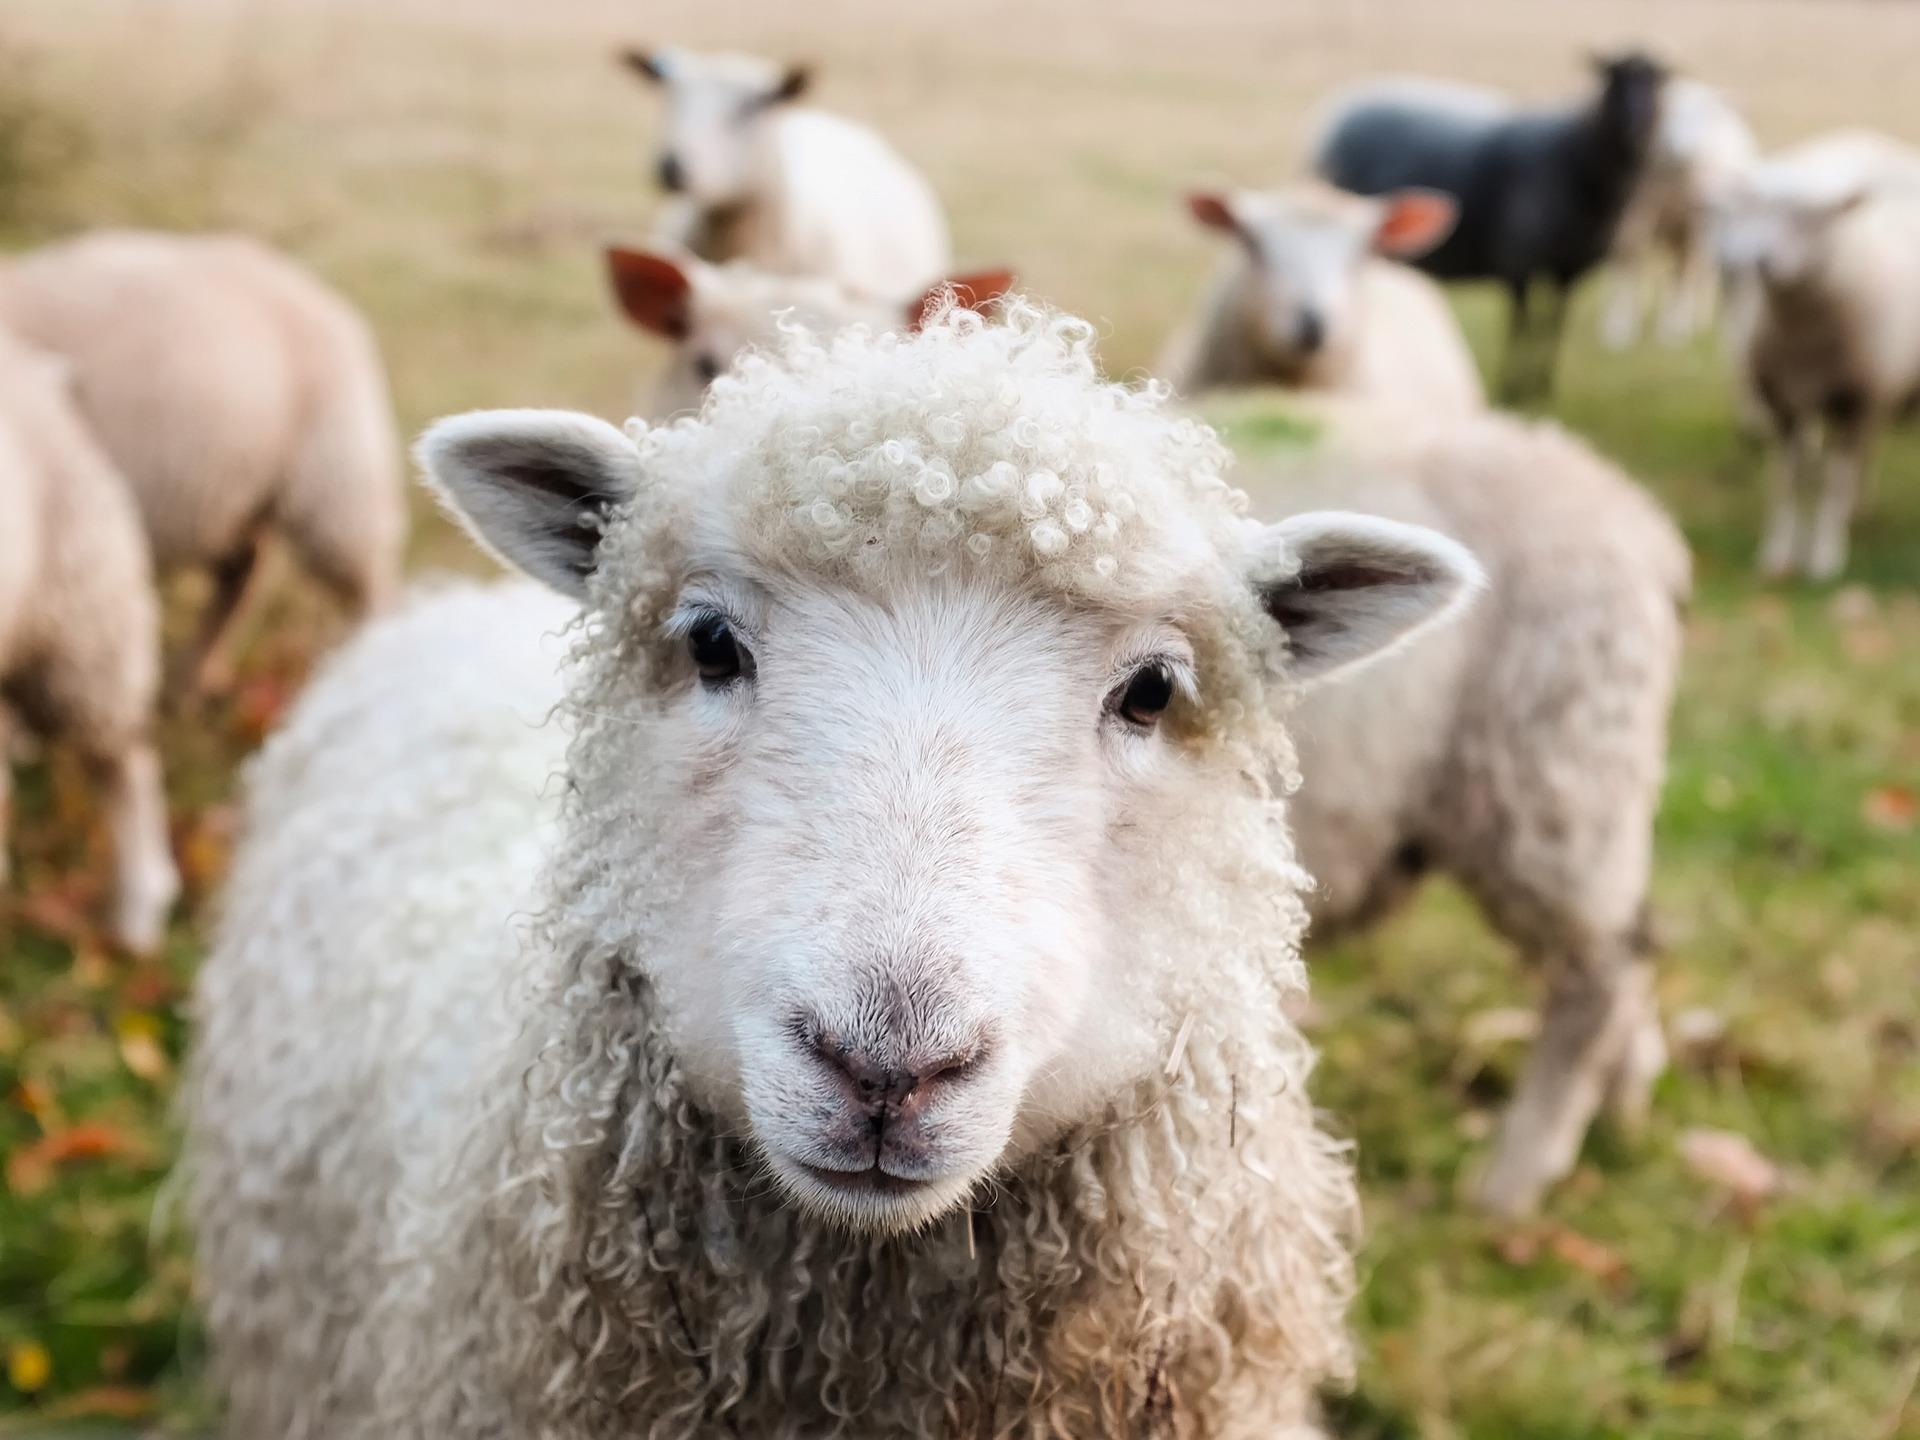 animales de la granja en inglés